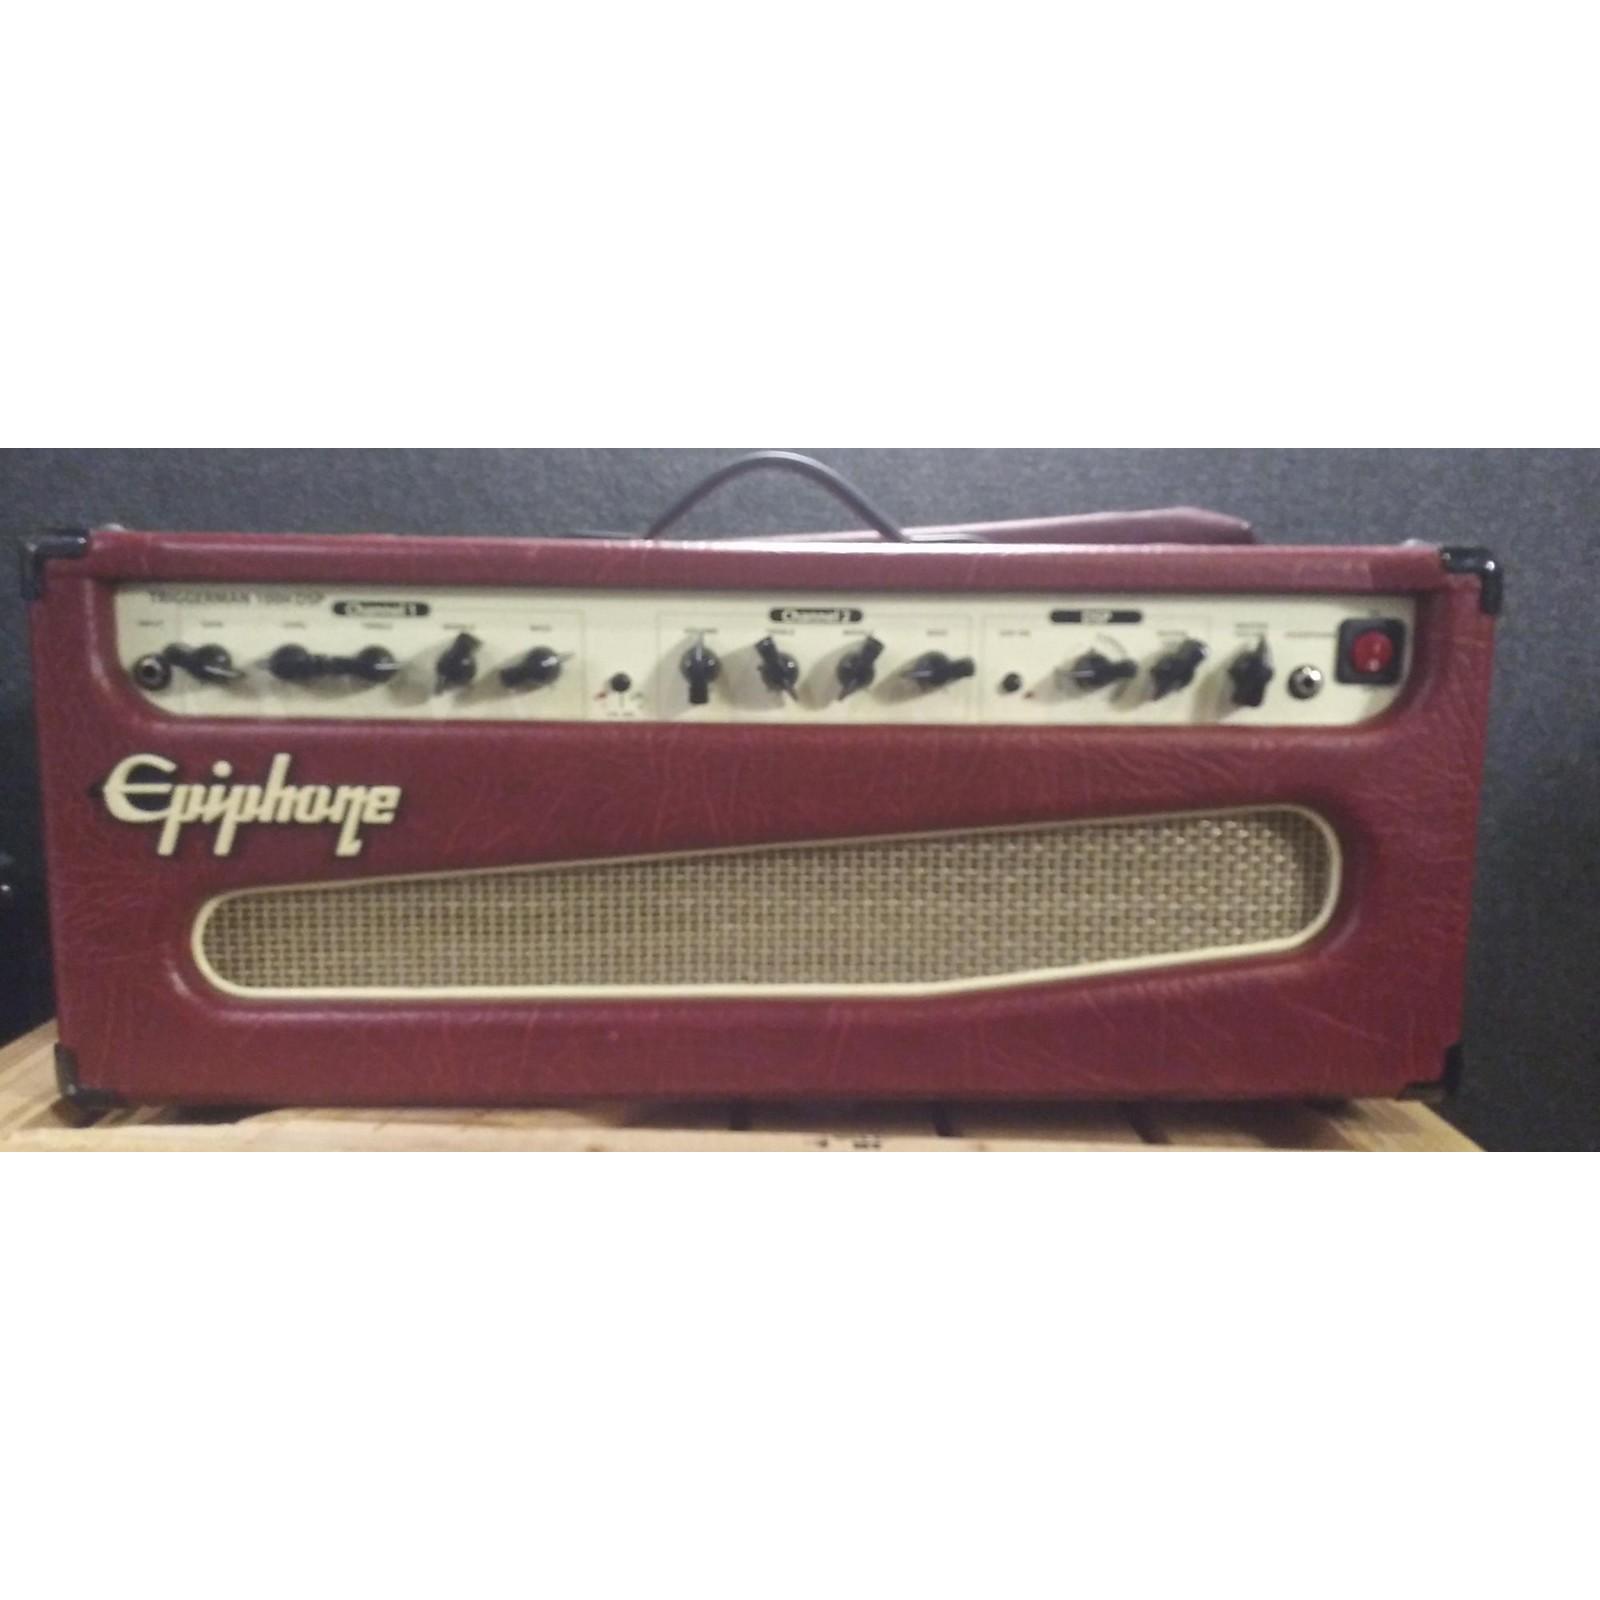 Epiphone Triggerman 100H DSP Solid State Guitar Amp Head